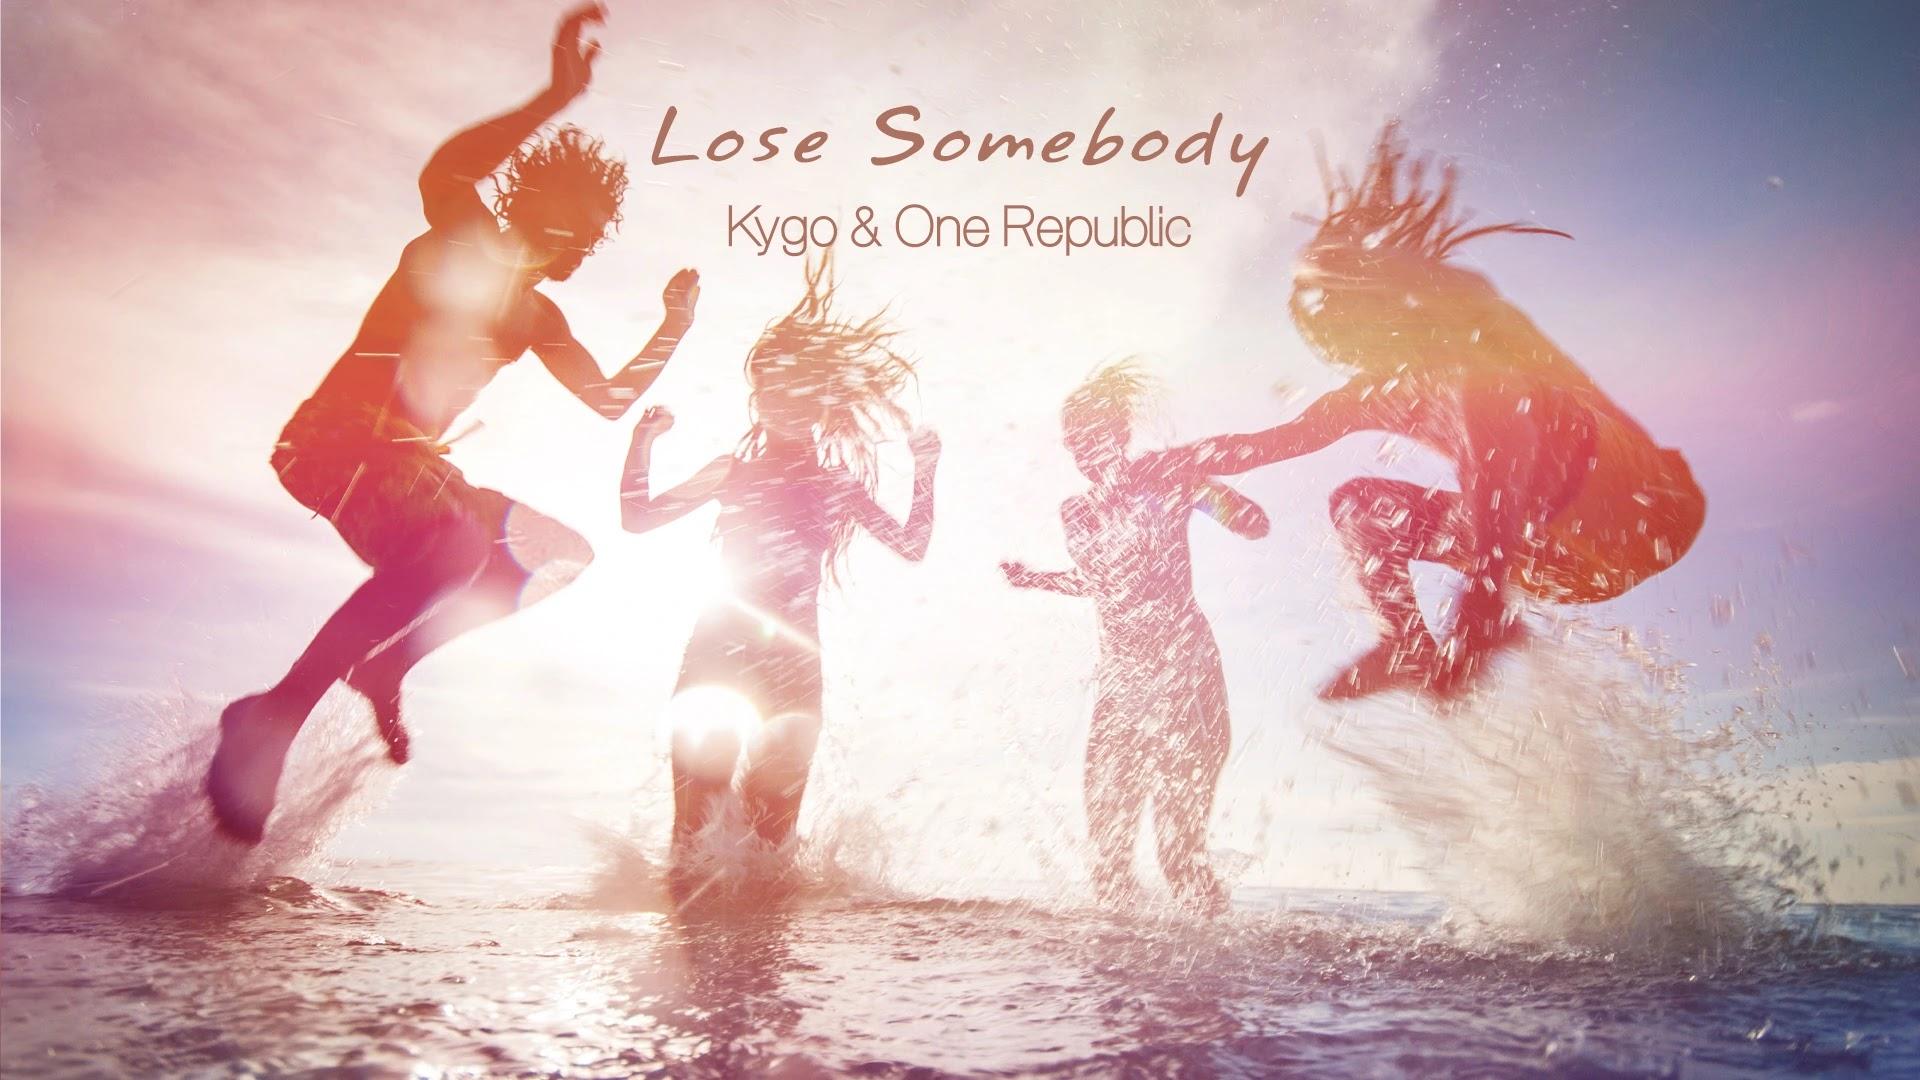 Lose Somebody - Kygo & One Republic